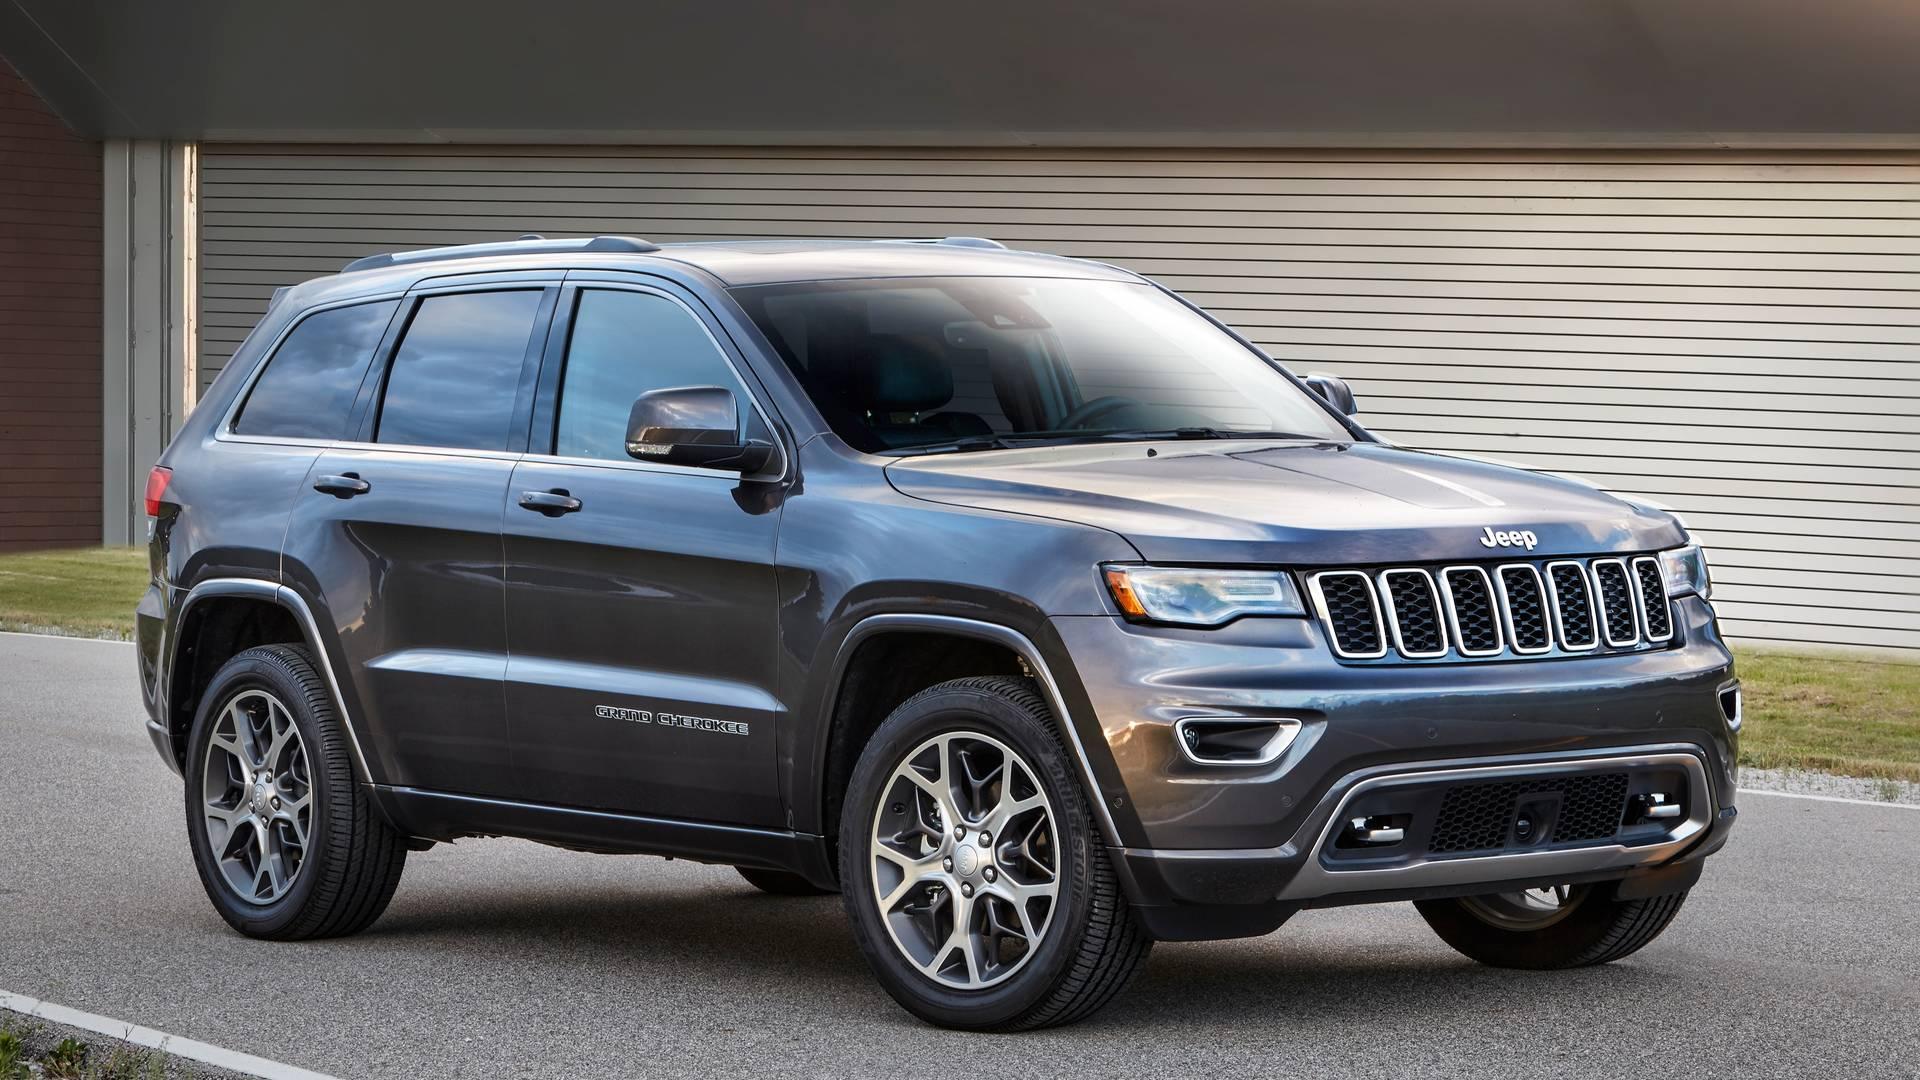 2021 Jeep Grand Cherokee Three-Row And Engine Updates >> Closed Fca Engine Plant May Build Three Row Jeep Grand Cherokee